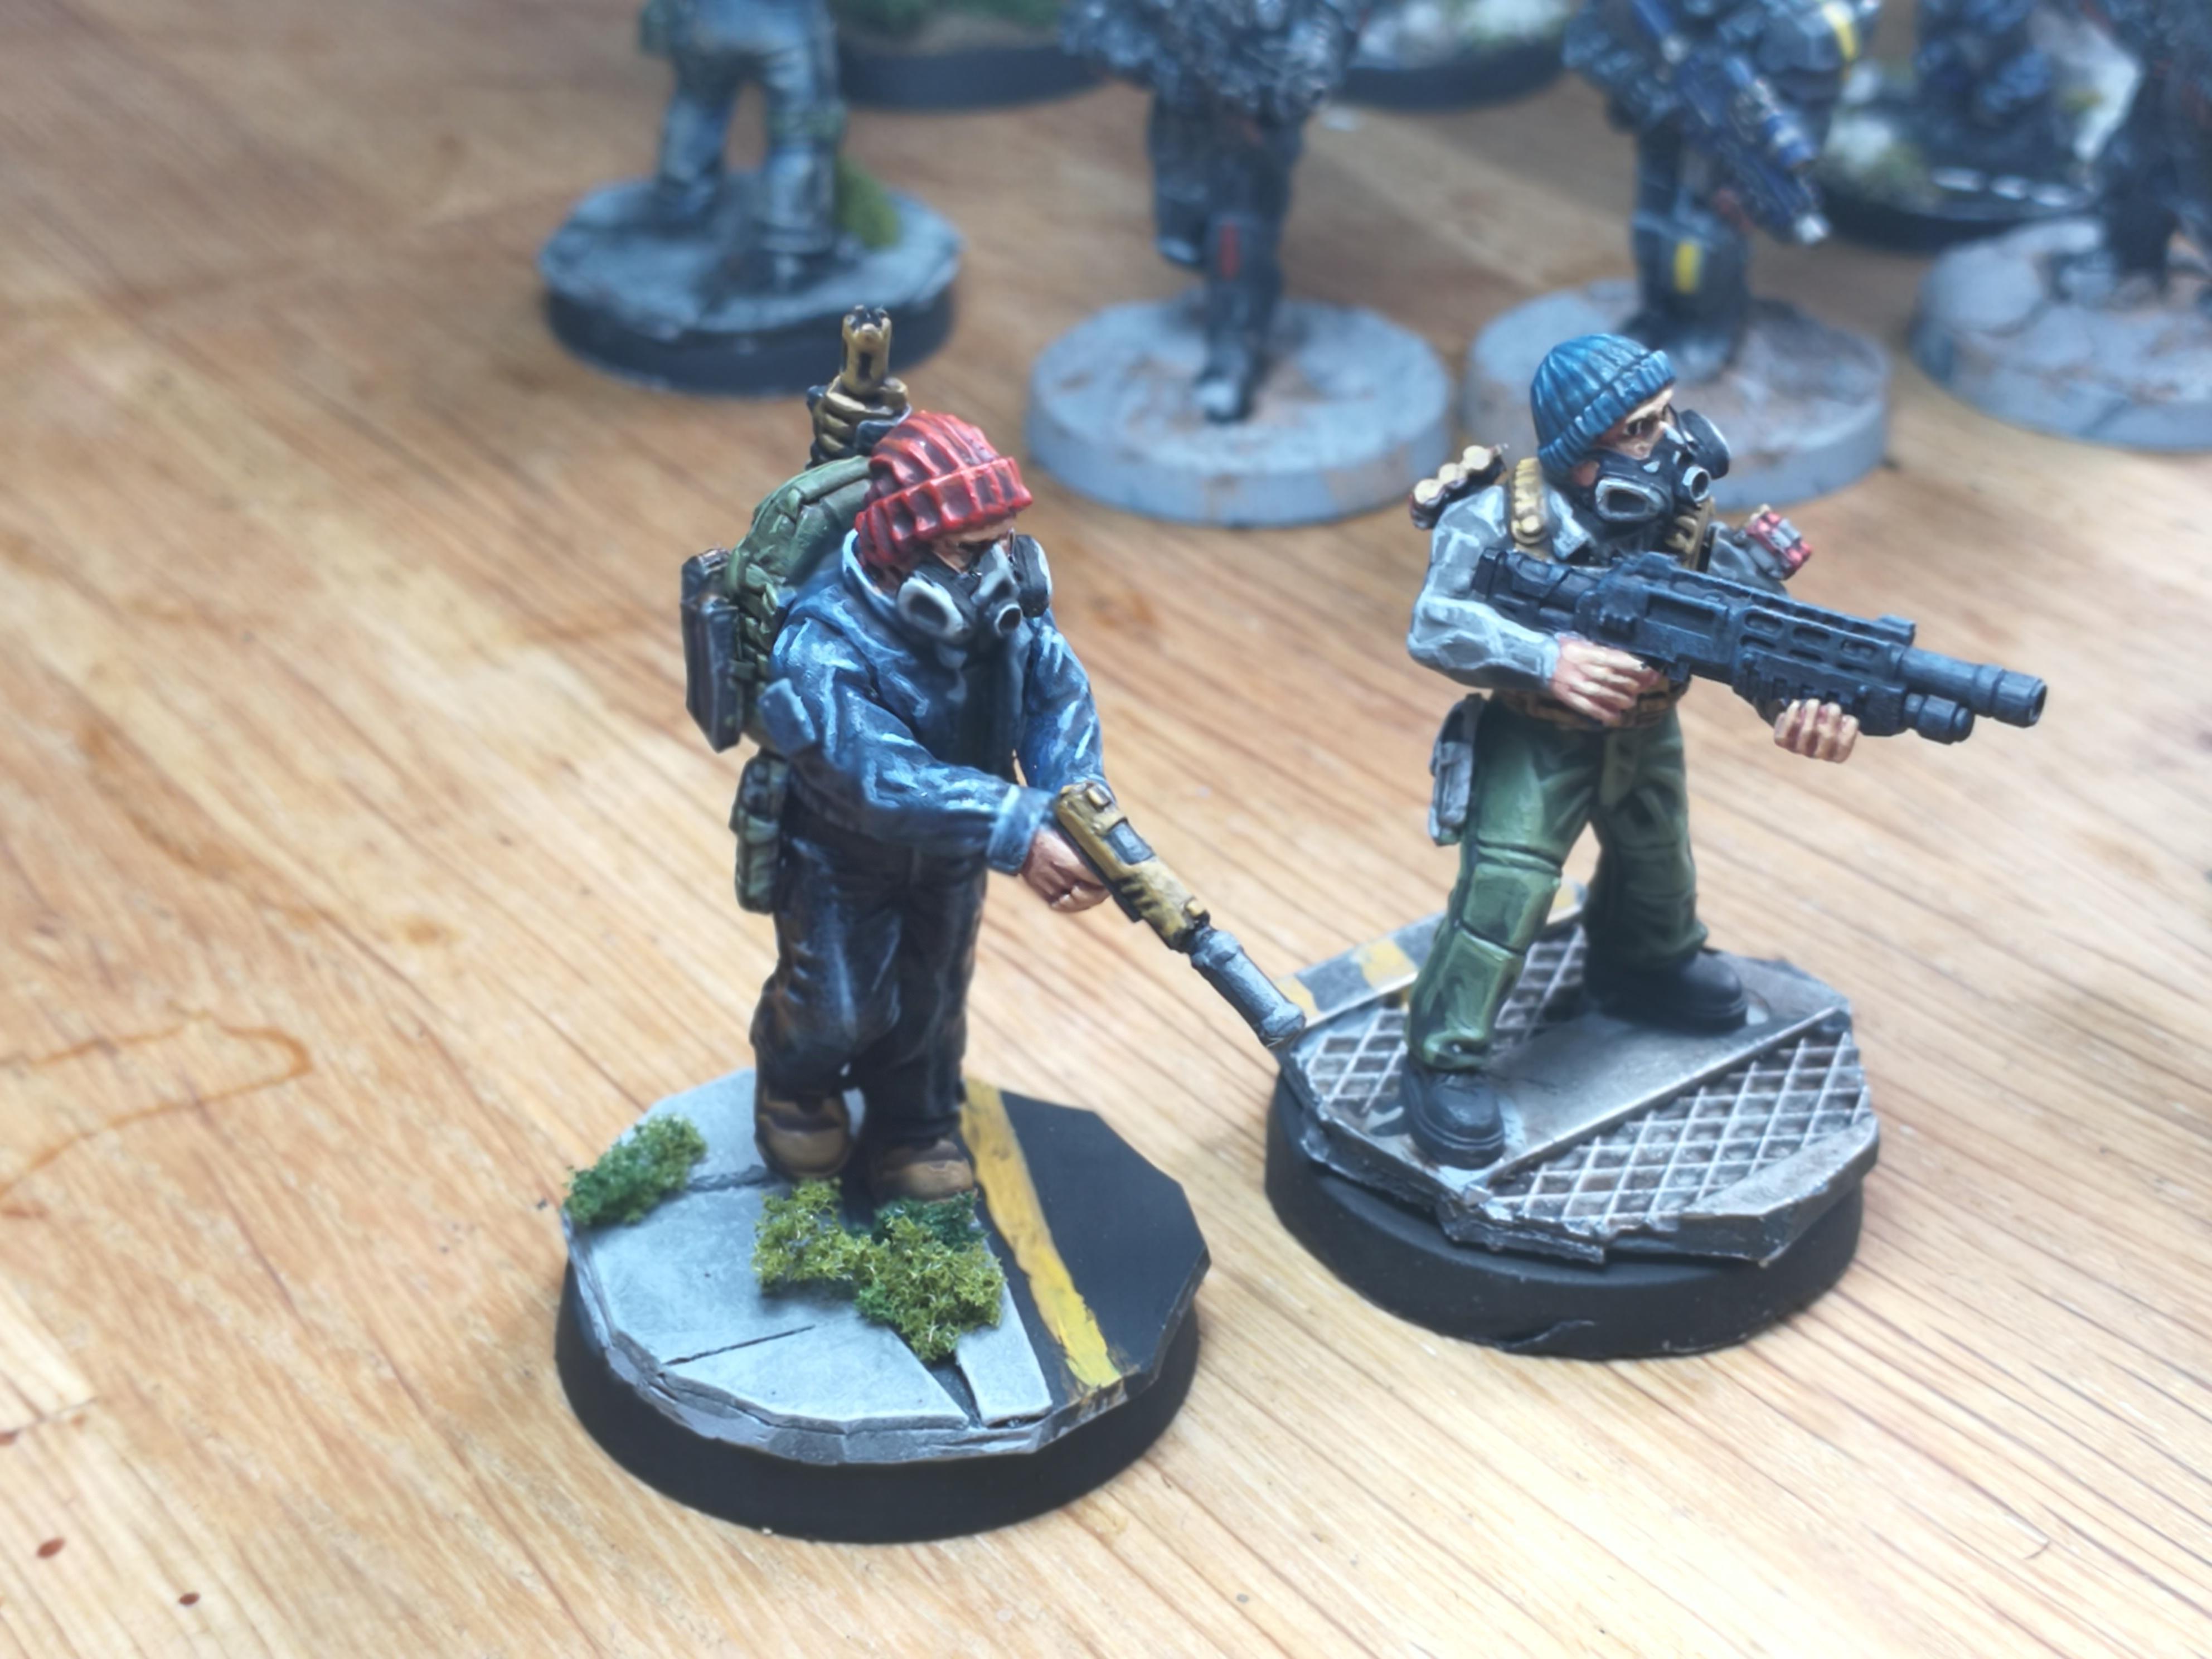 28mm, Anvil, Anvilindustry, Regiments